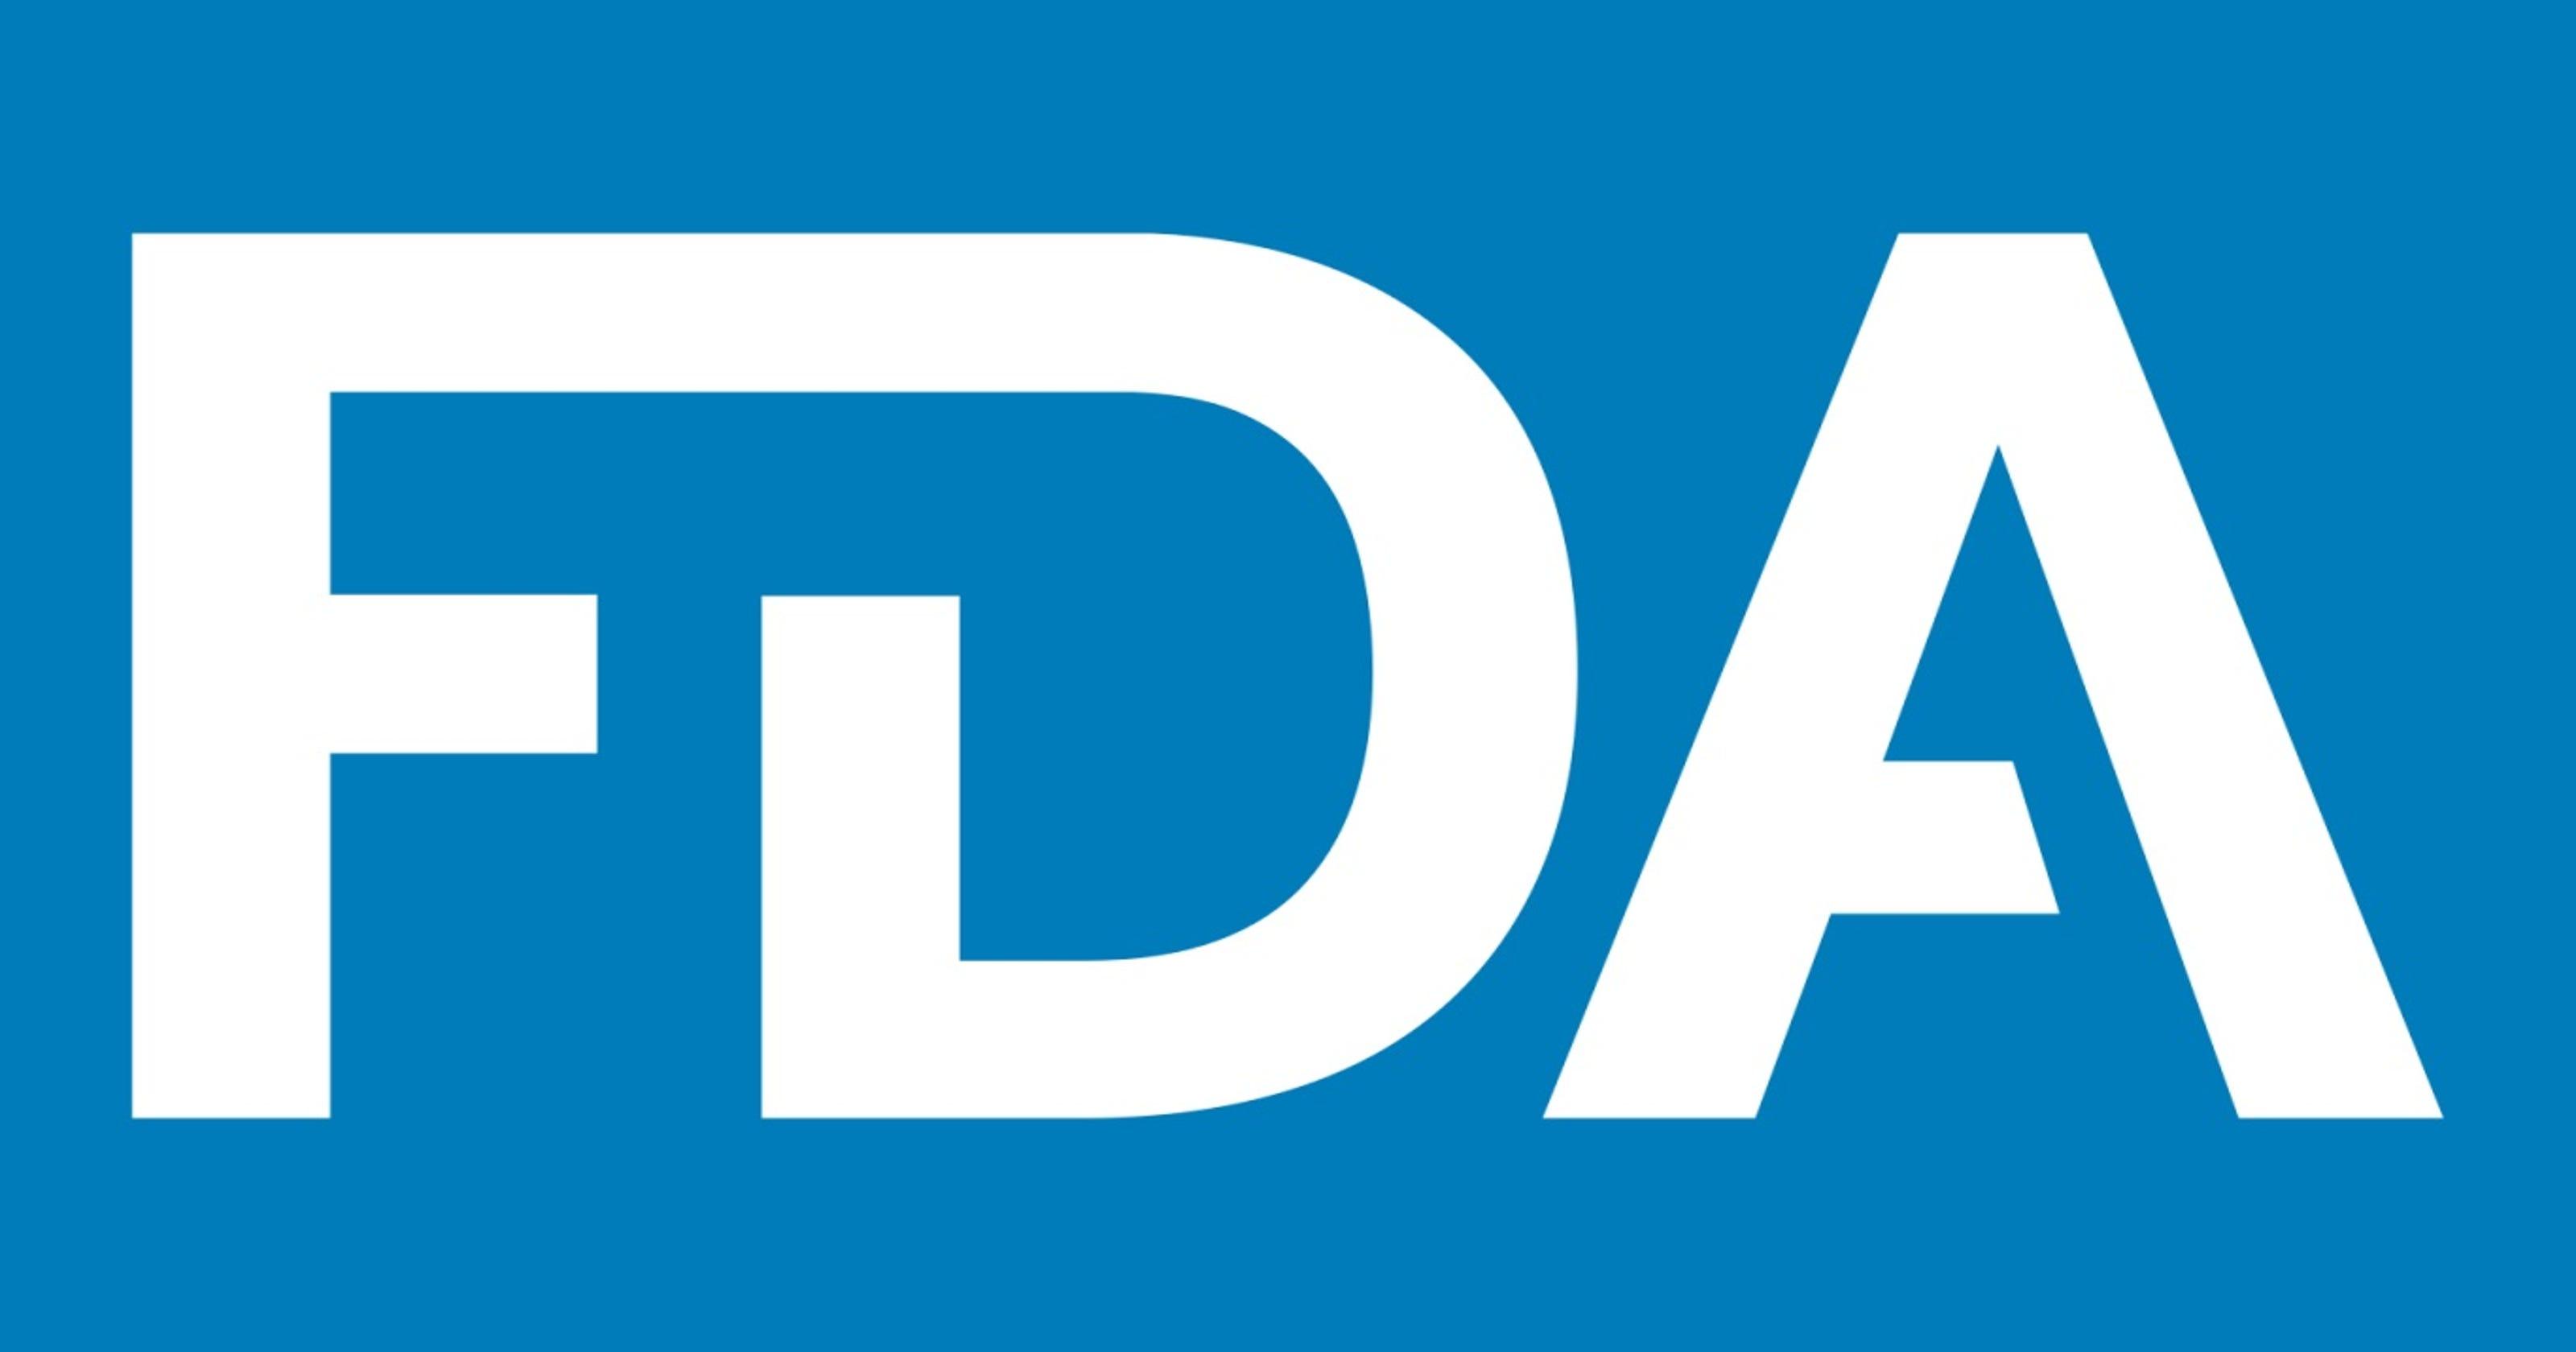 Fda Did Not Issue New Statement On >> New Cancer Drug Vitrakvi Larotrectinib Hits Genetic Links Not Organs